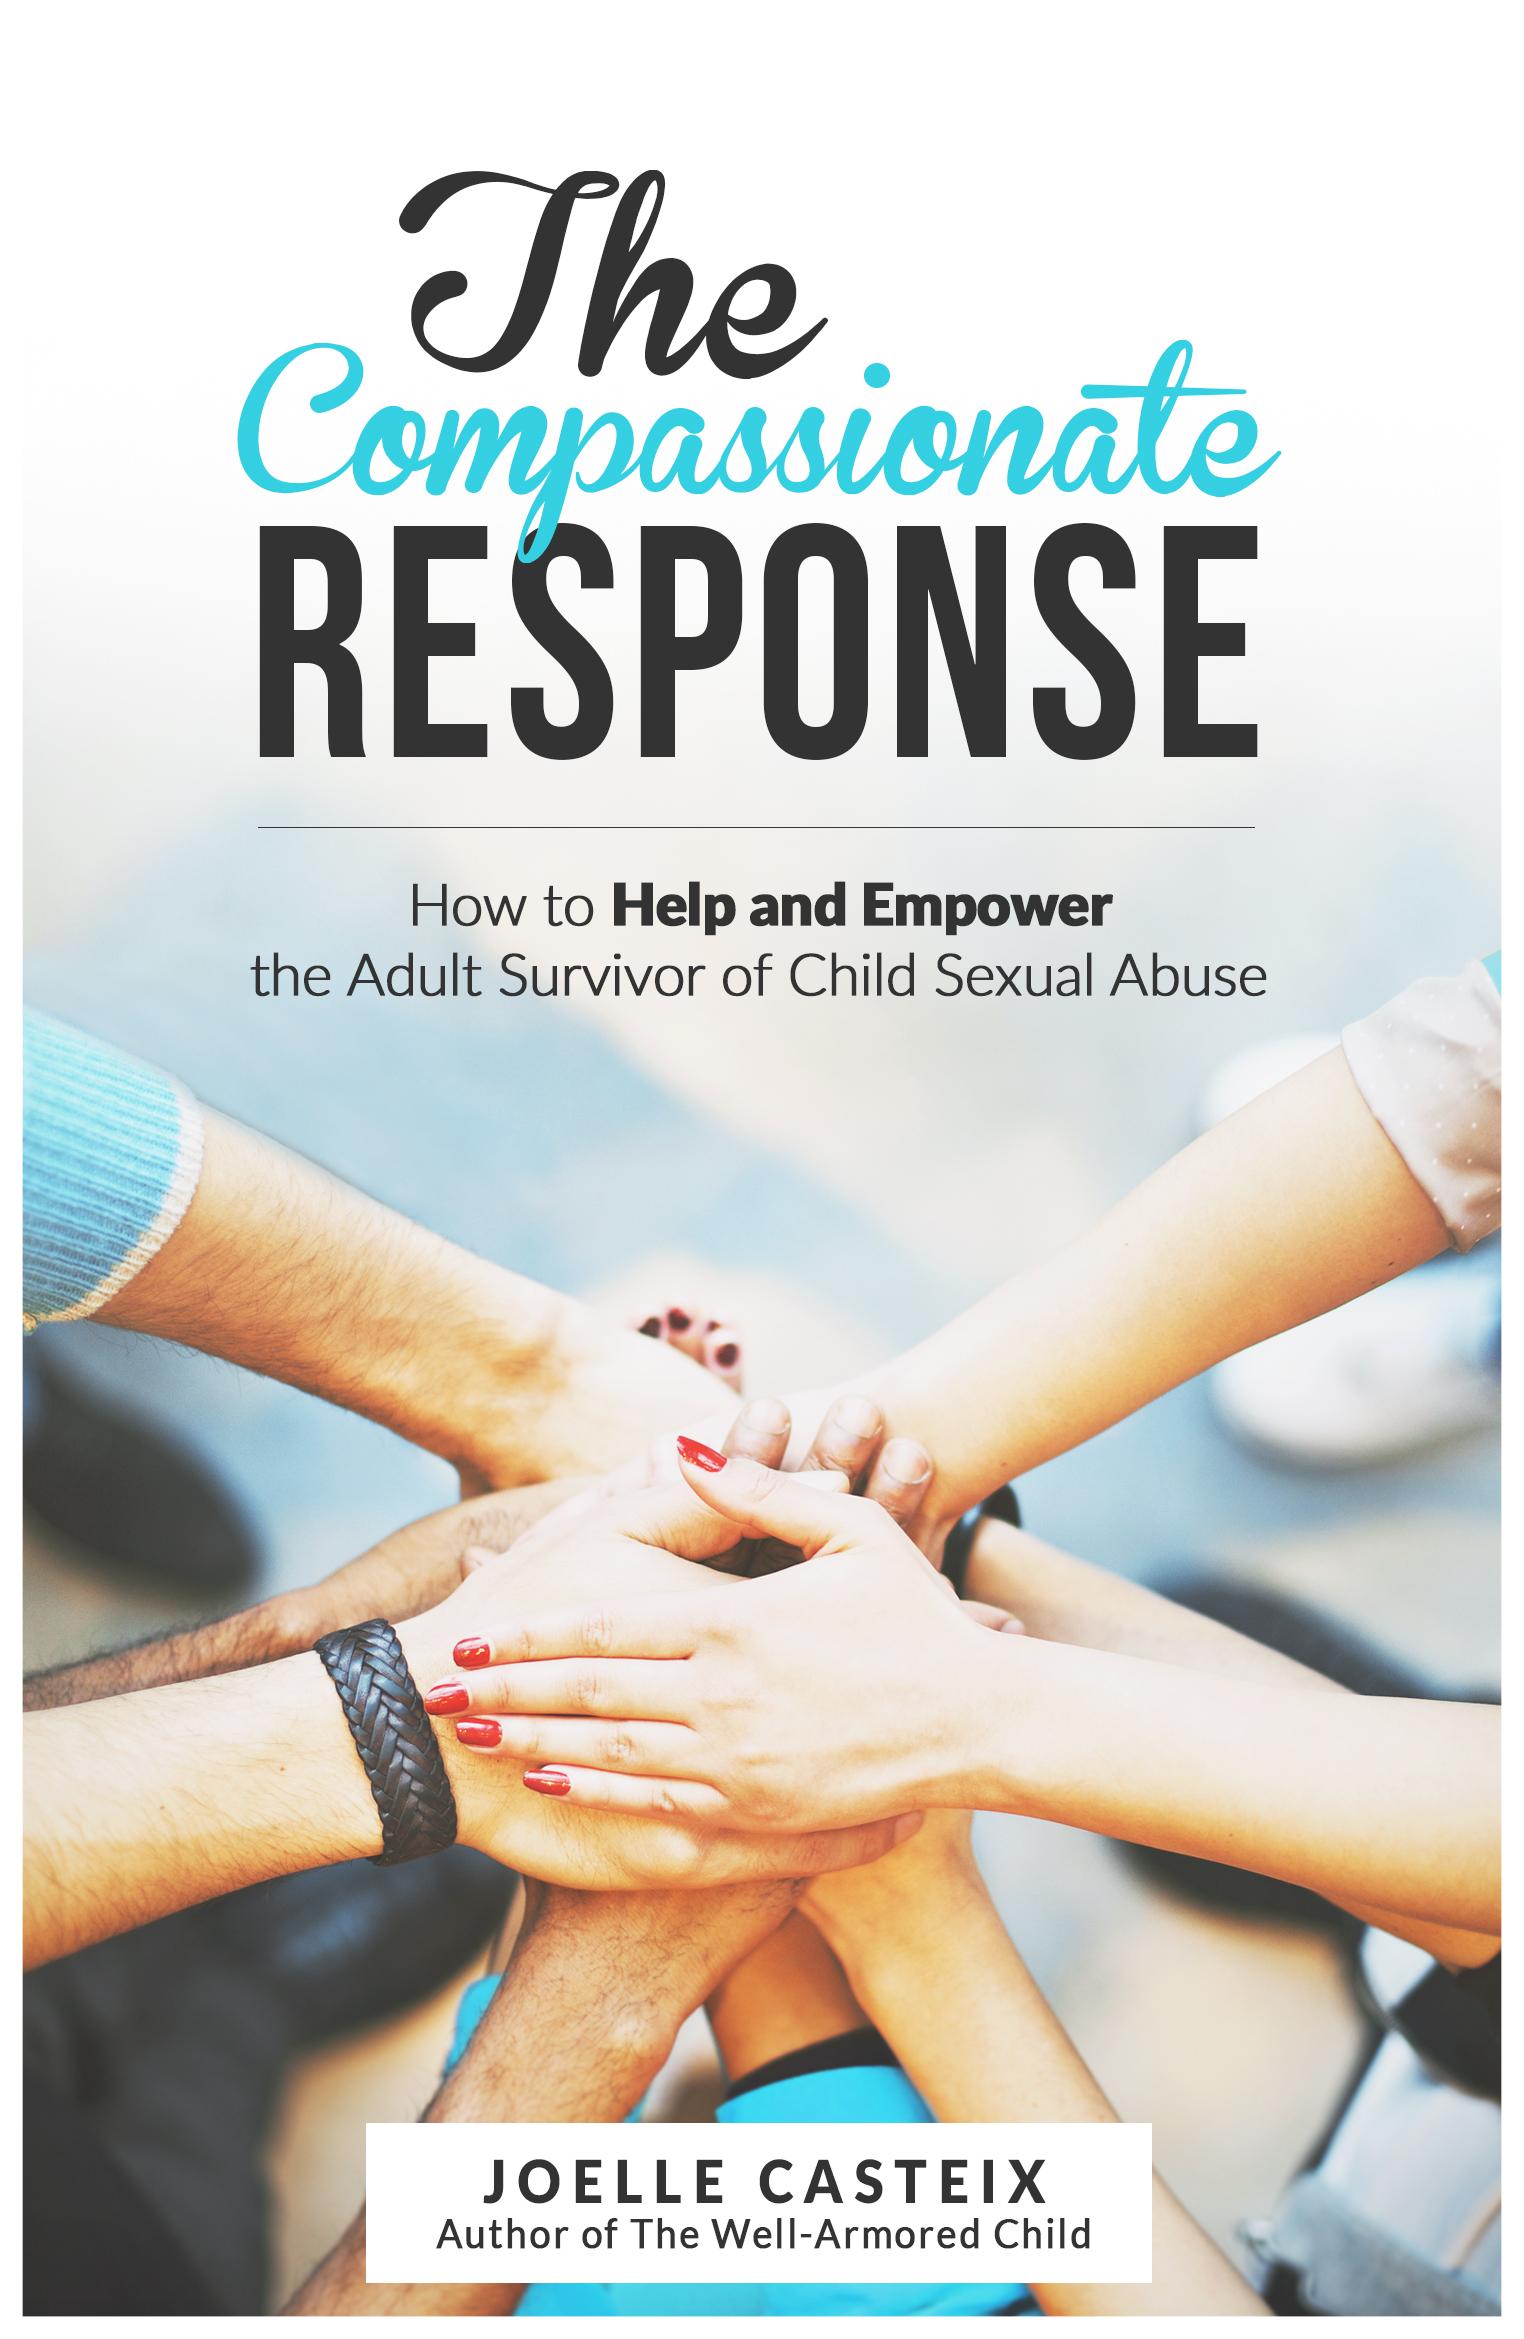 TheCompassionateResponse_v3